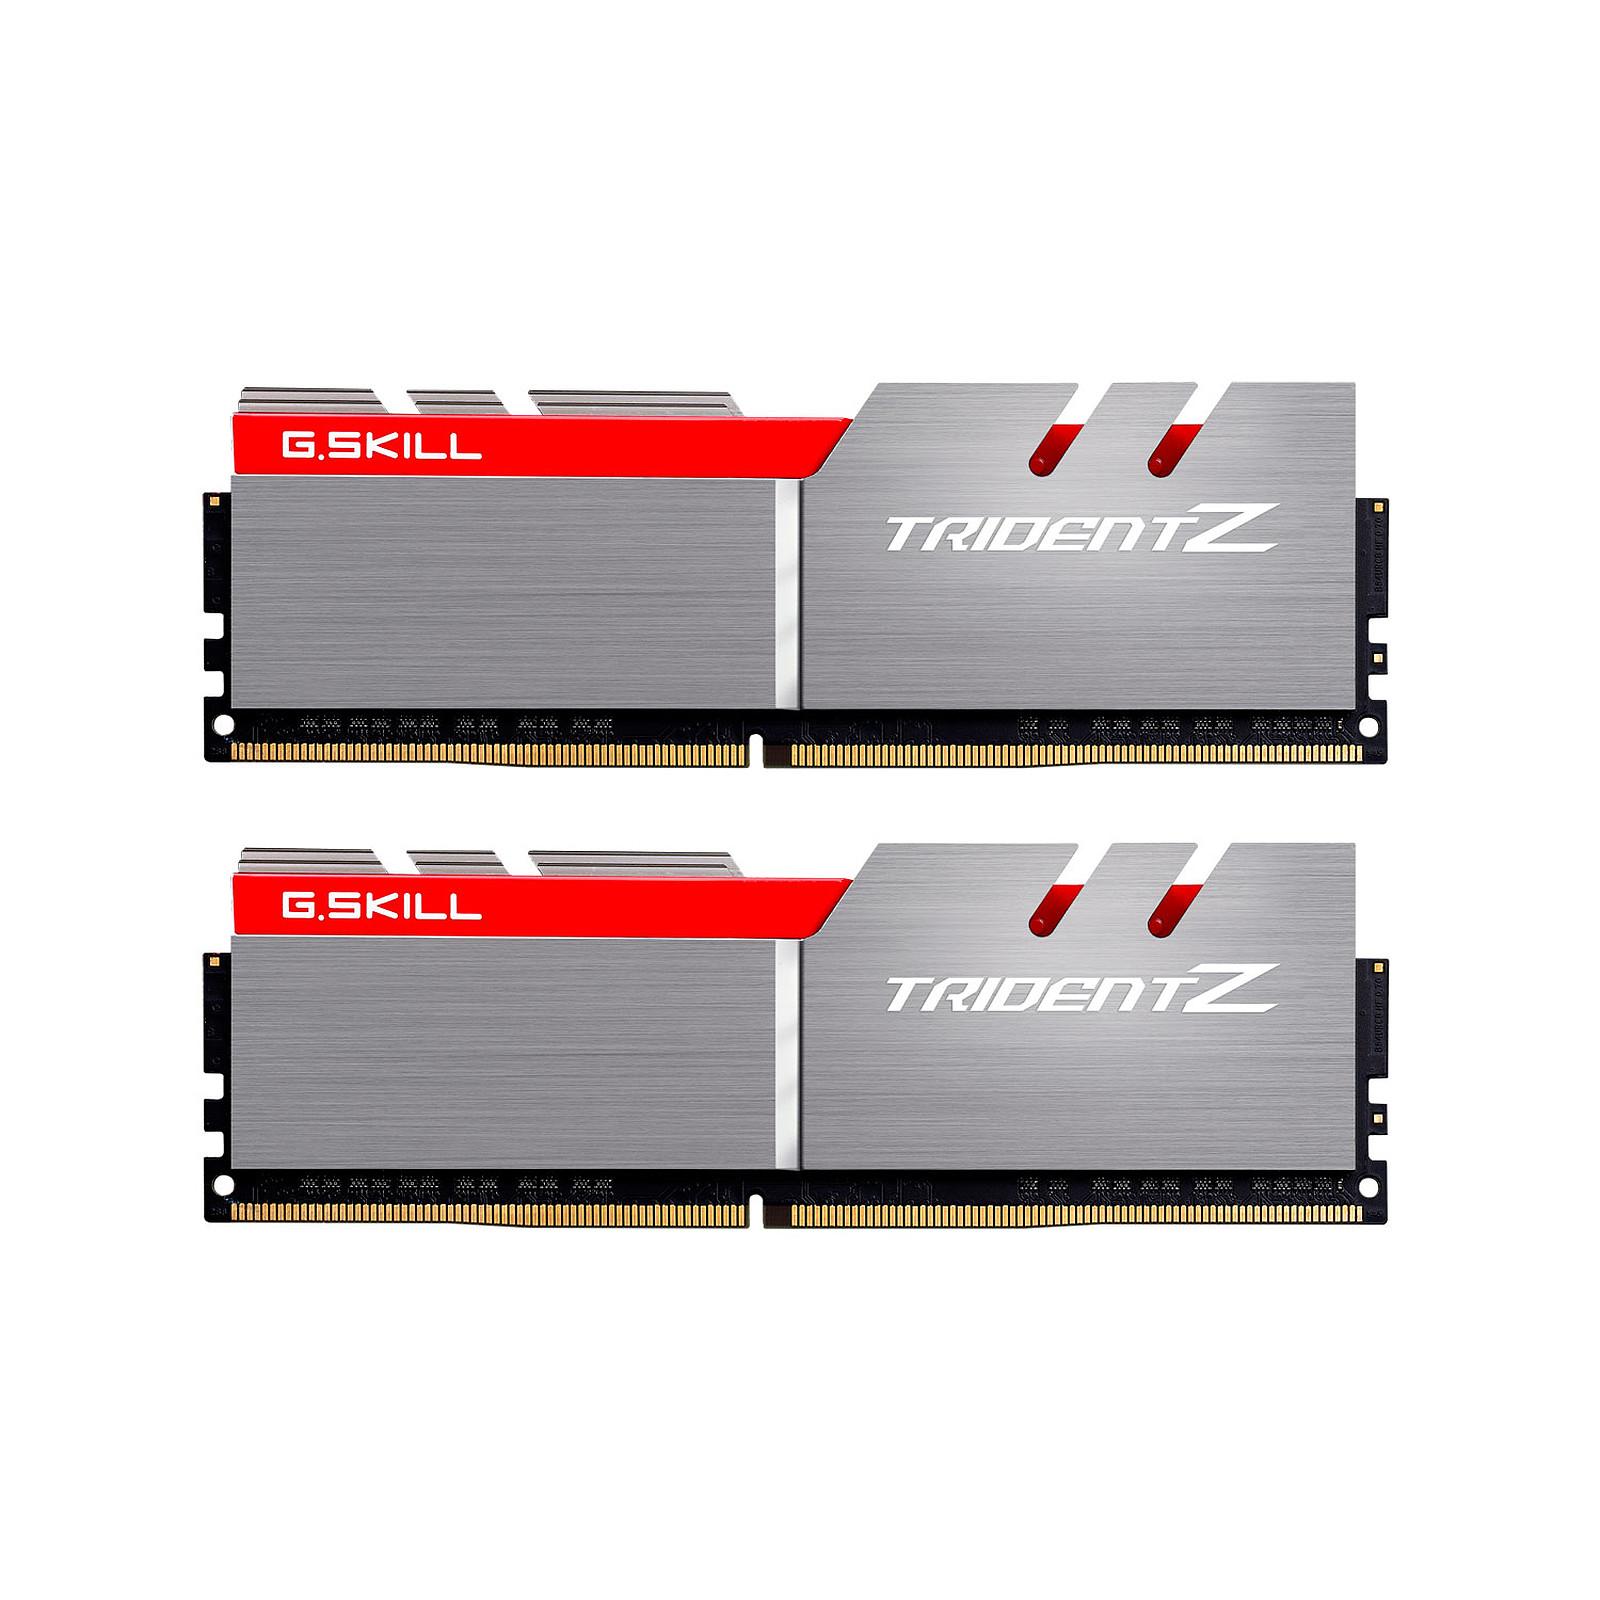 G.Skill Trident Z 16 Go (2x 8 Go) DDR4 3400 MHz CL16